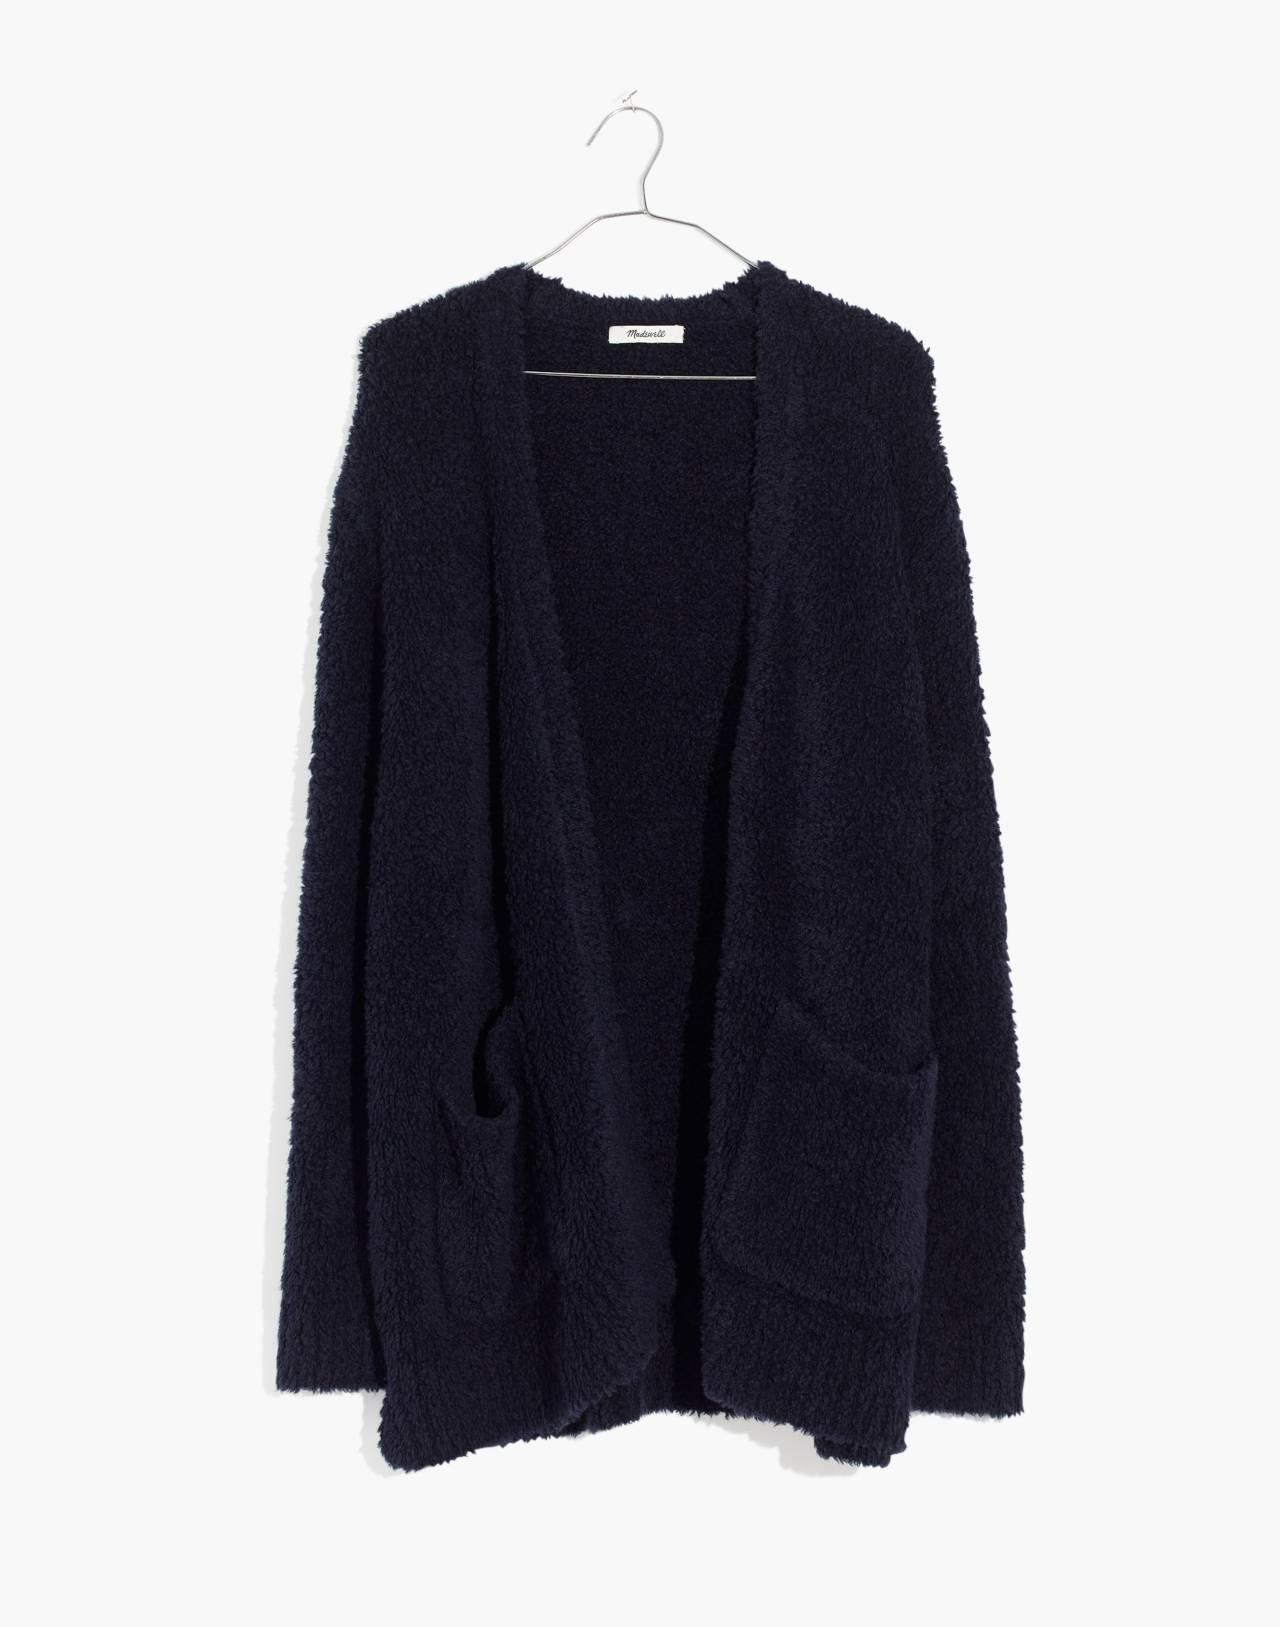 Teddy Cardigan Sweater in dark navy image 4